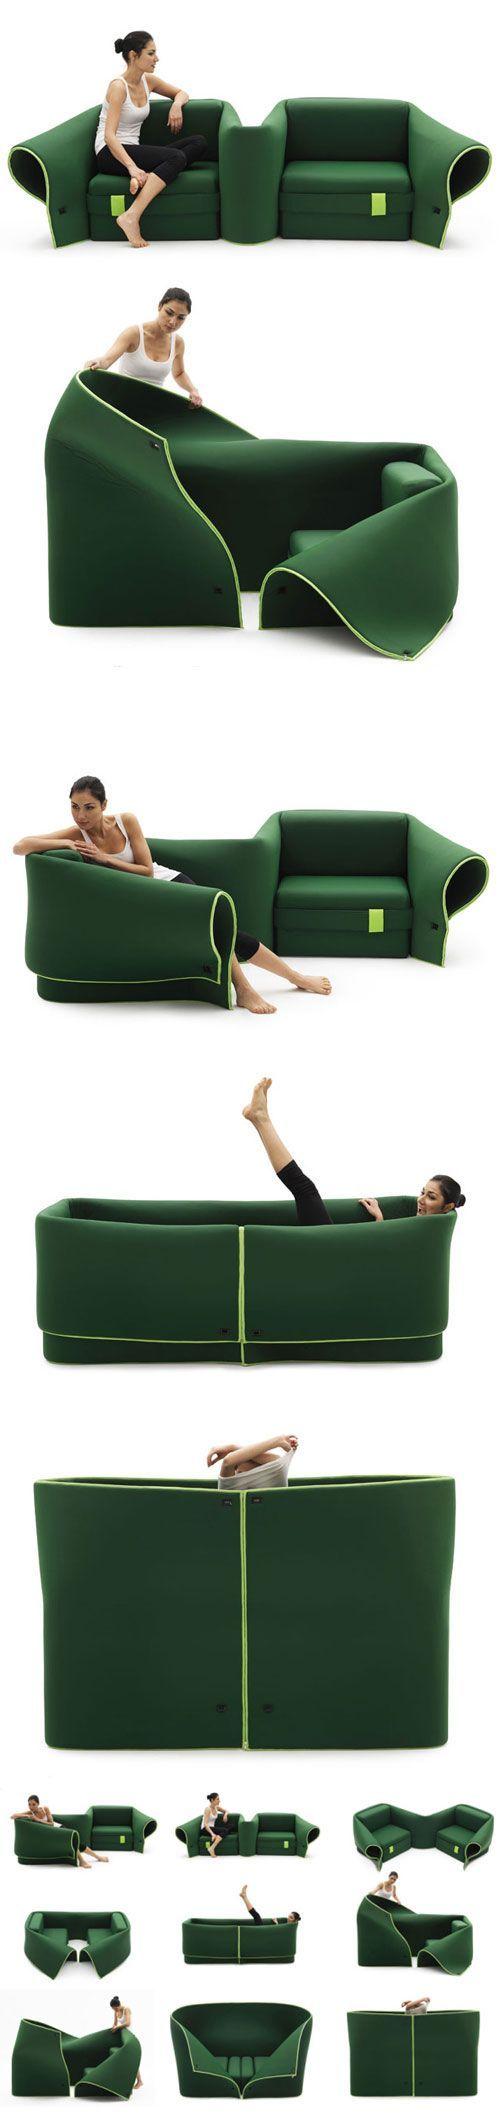 Convertible Sofa hmmmm yes please